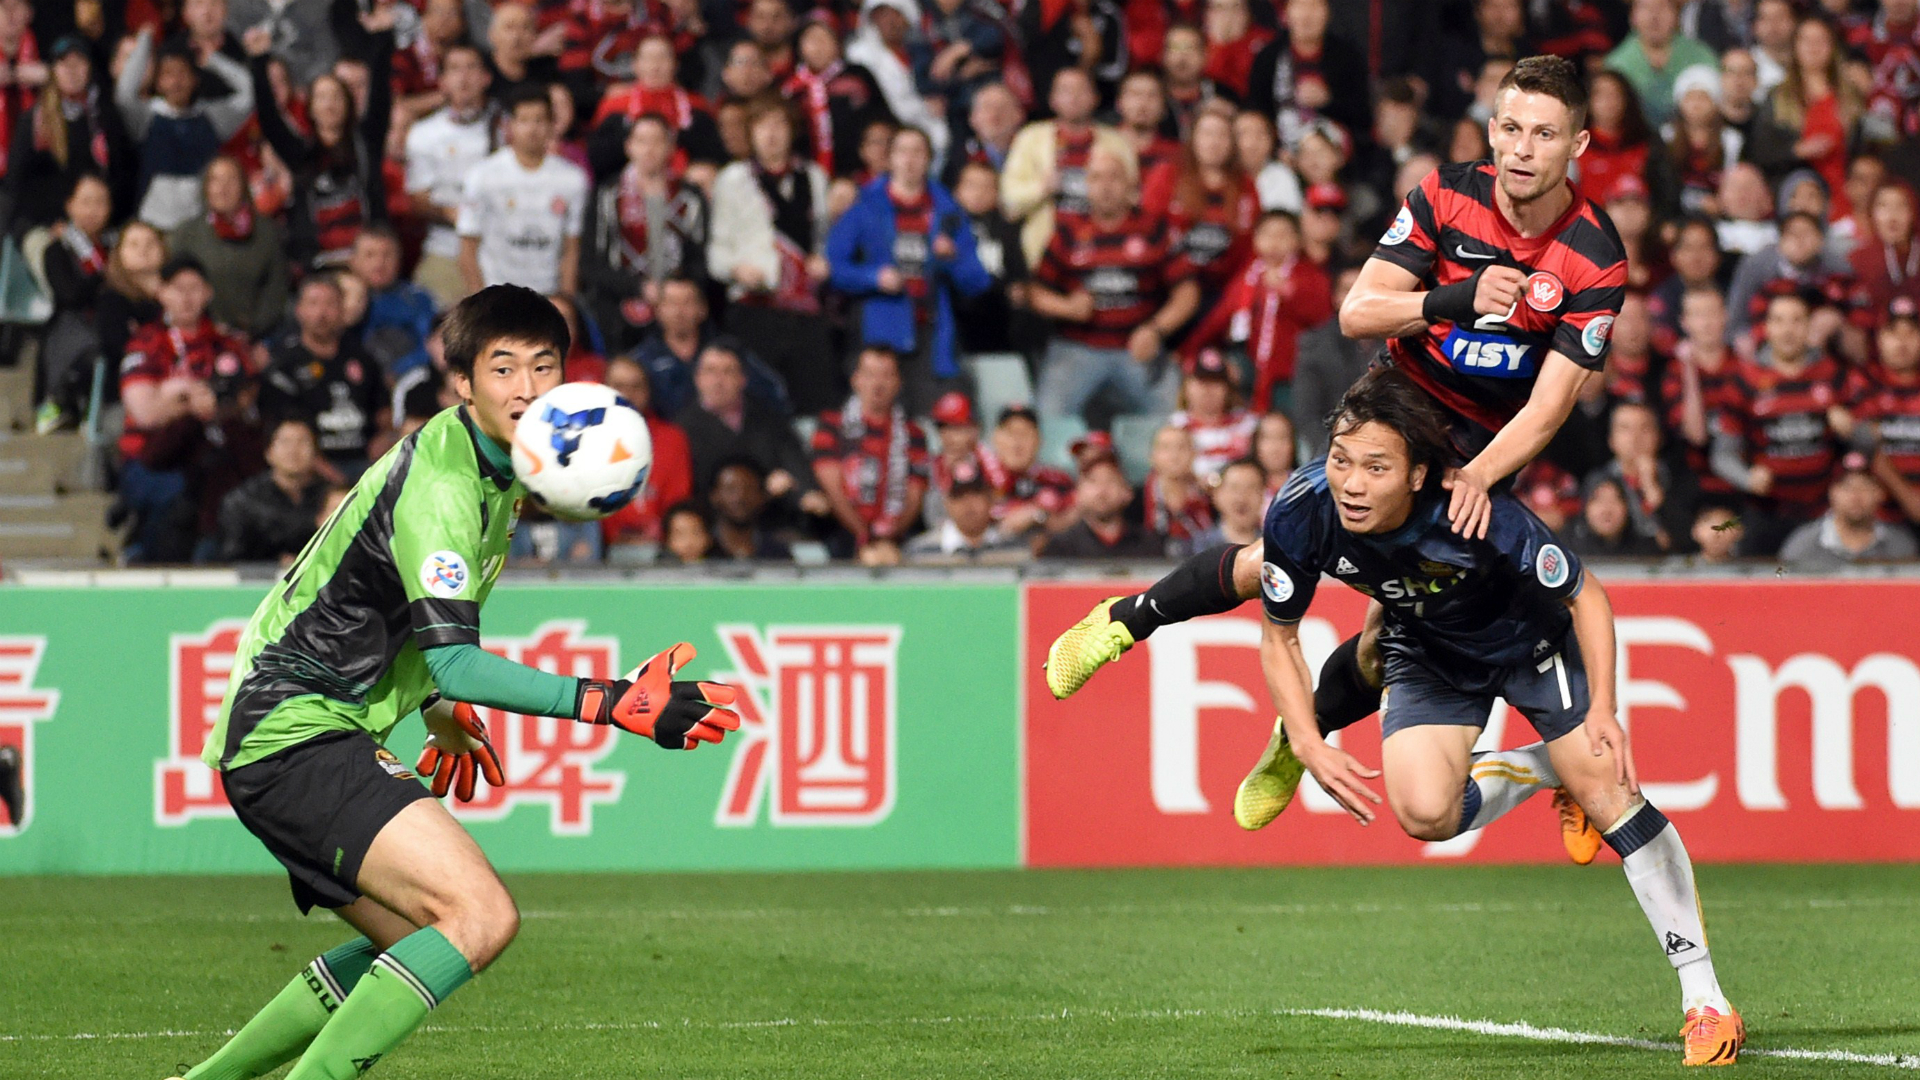 Shannon Cole Western Sydney Wanderers v FC Seoul AFC Champions League 01102014